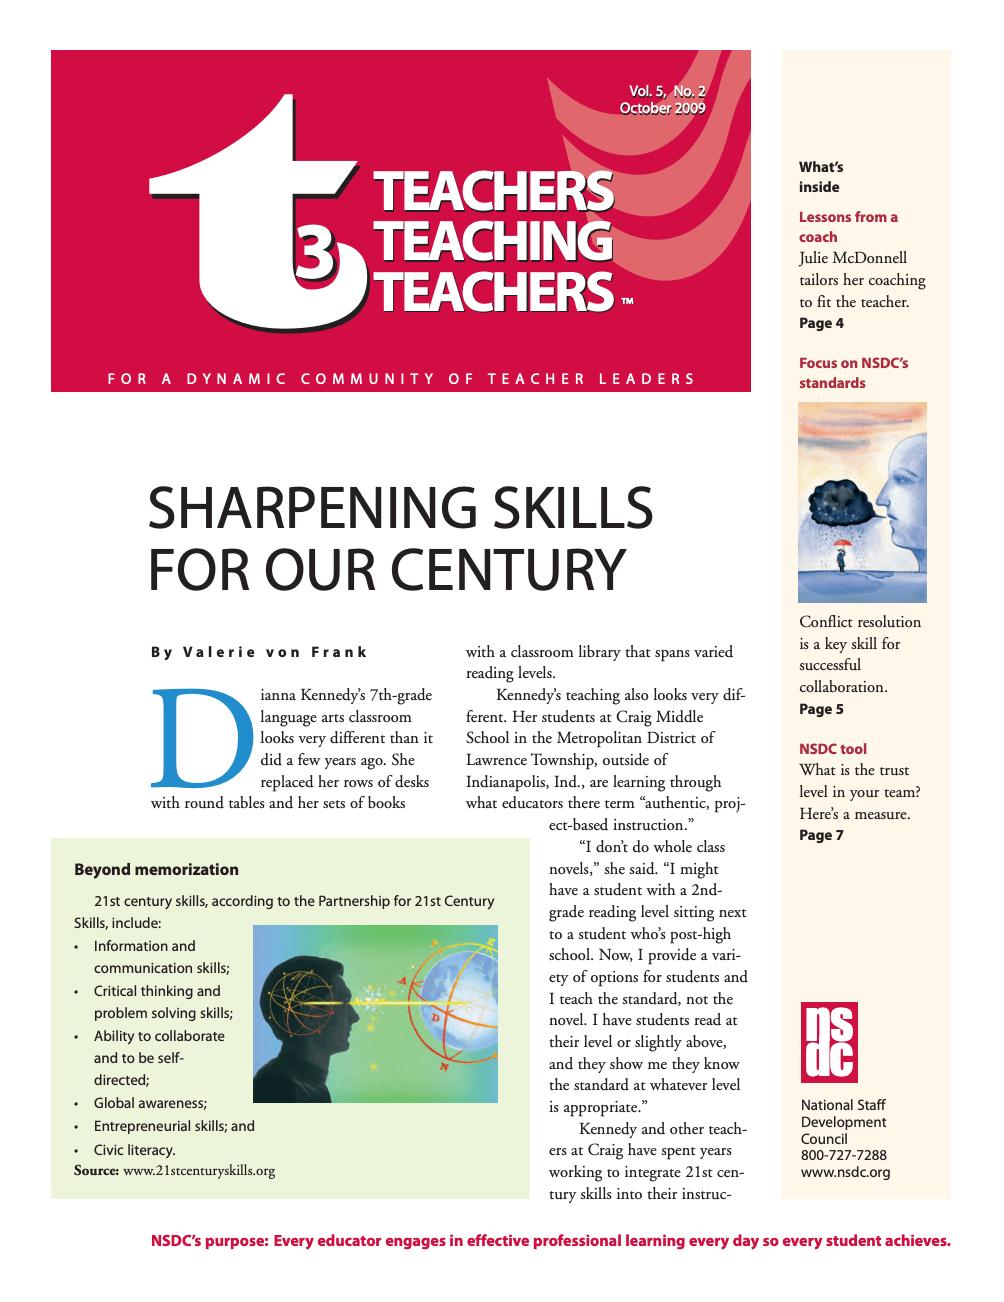 teachers-teaching-teachers-2009-vol-5-no-2